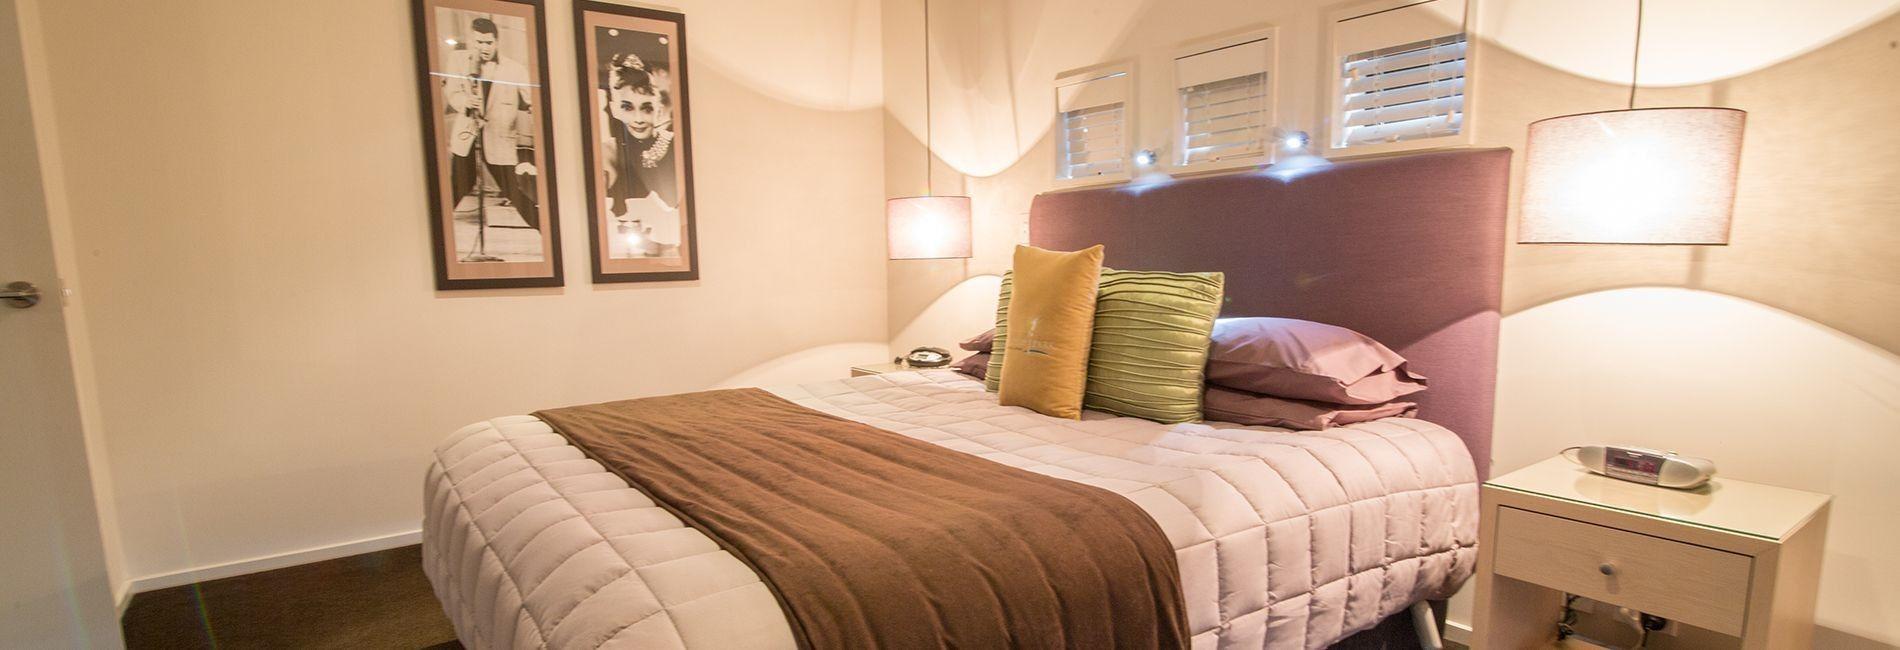 nelson city motel